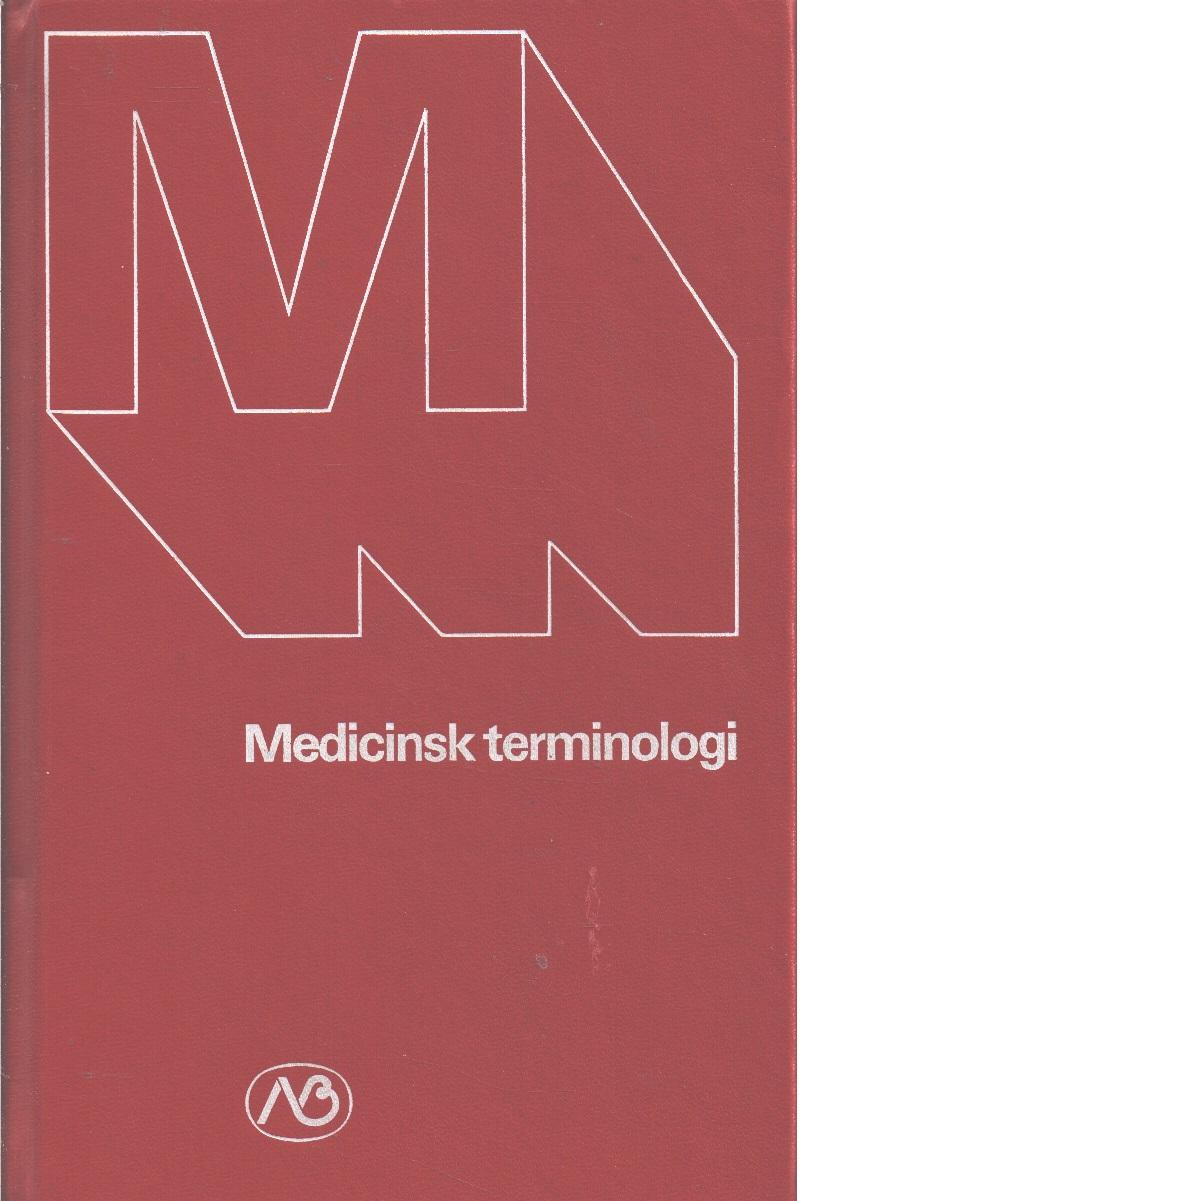 Medicinsk terminologi : lexikon A-Ö - Lindskog, Bengt I. och  Zetterberg, Bengt L.,